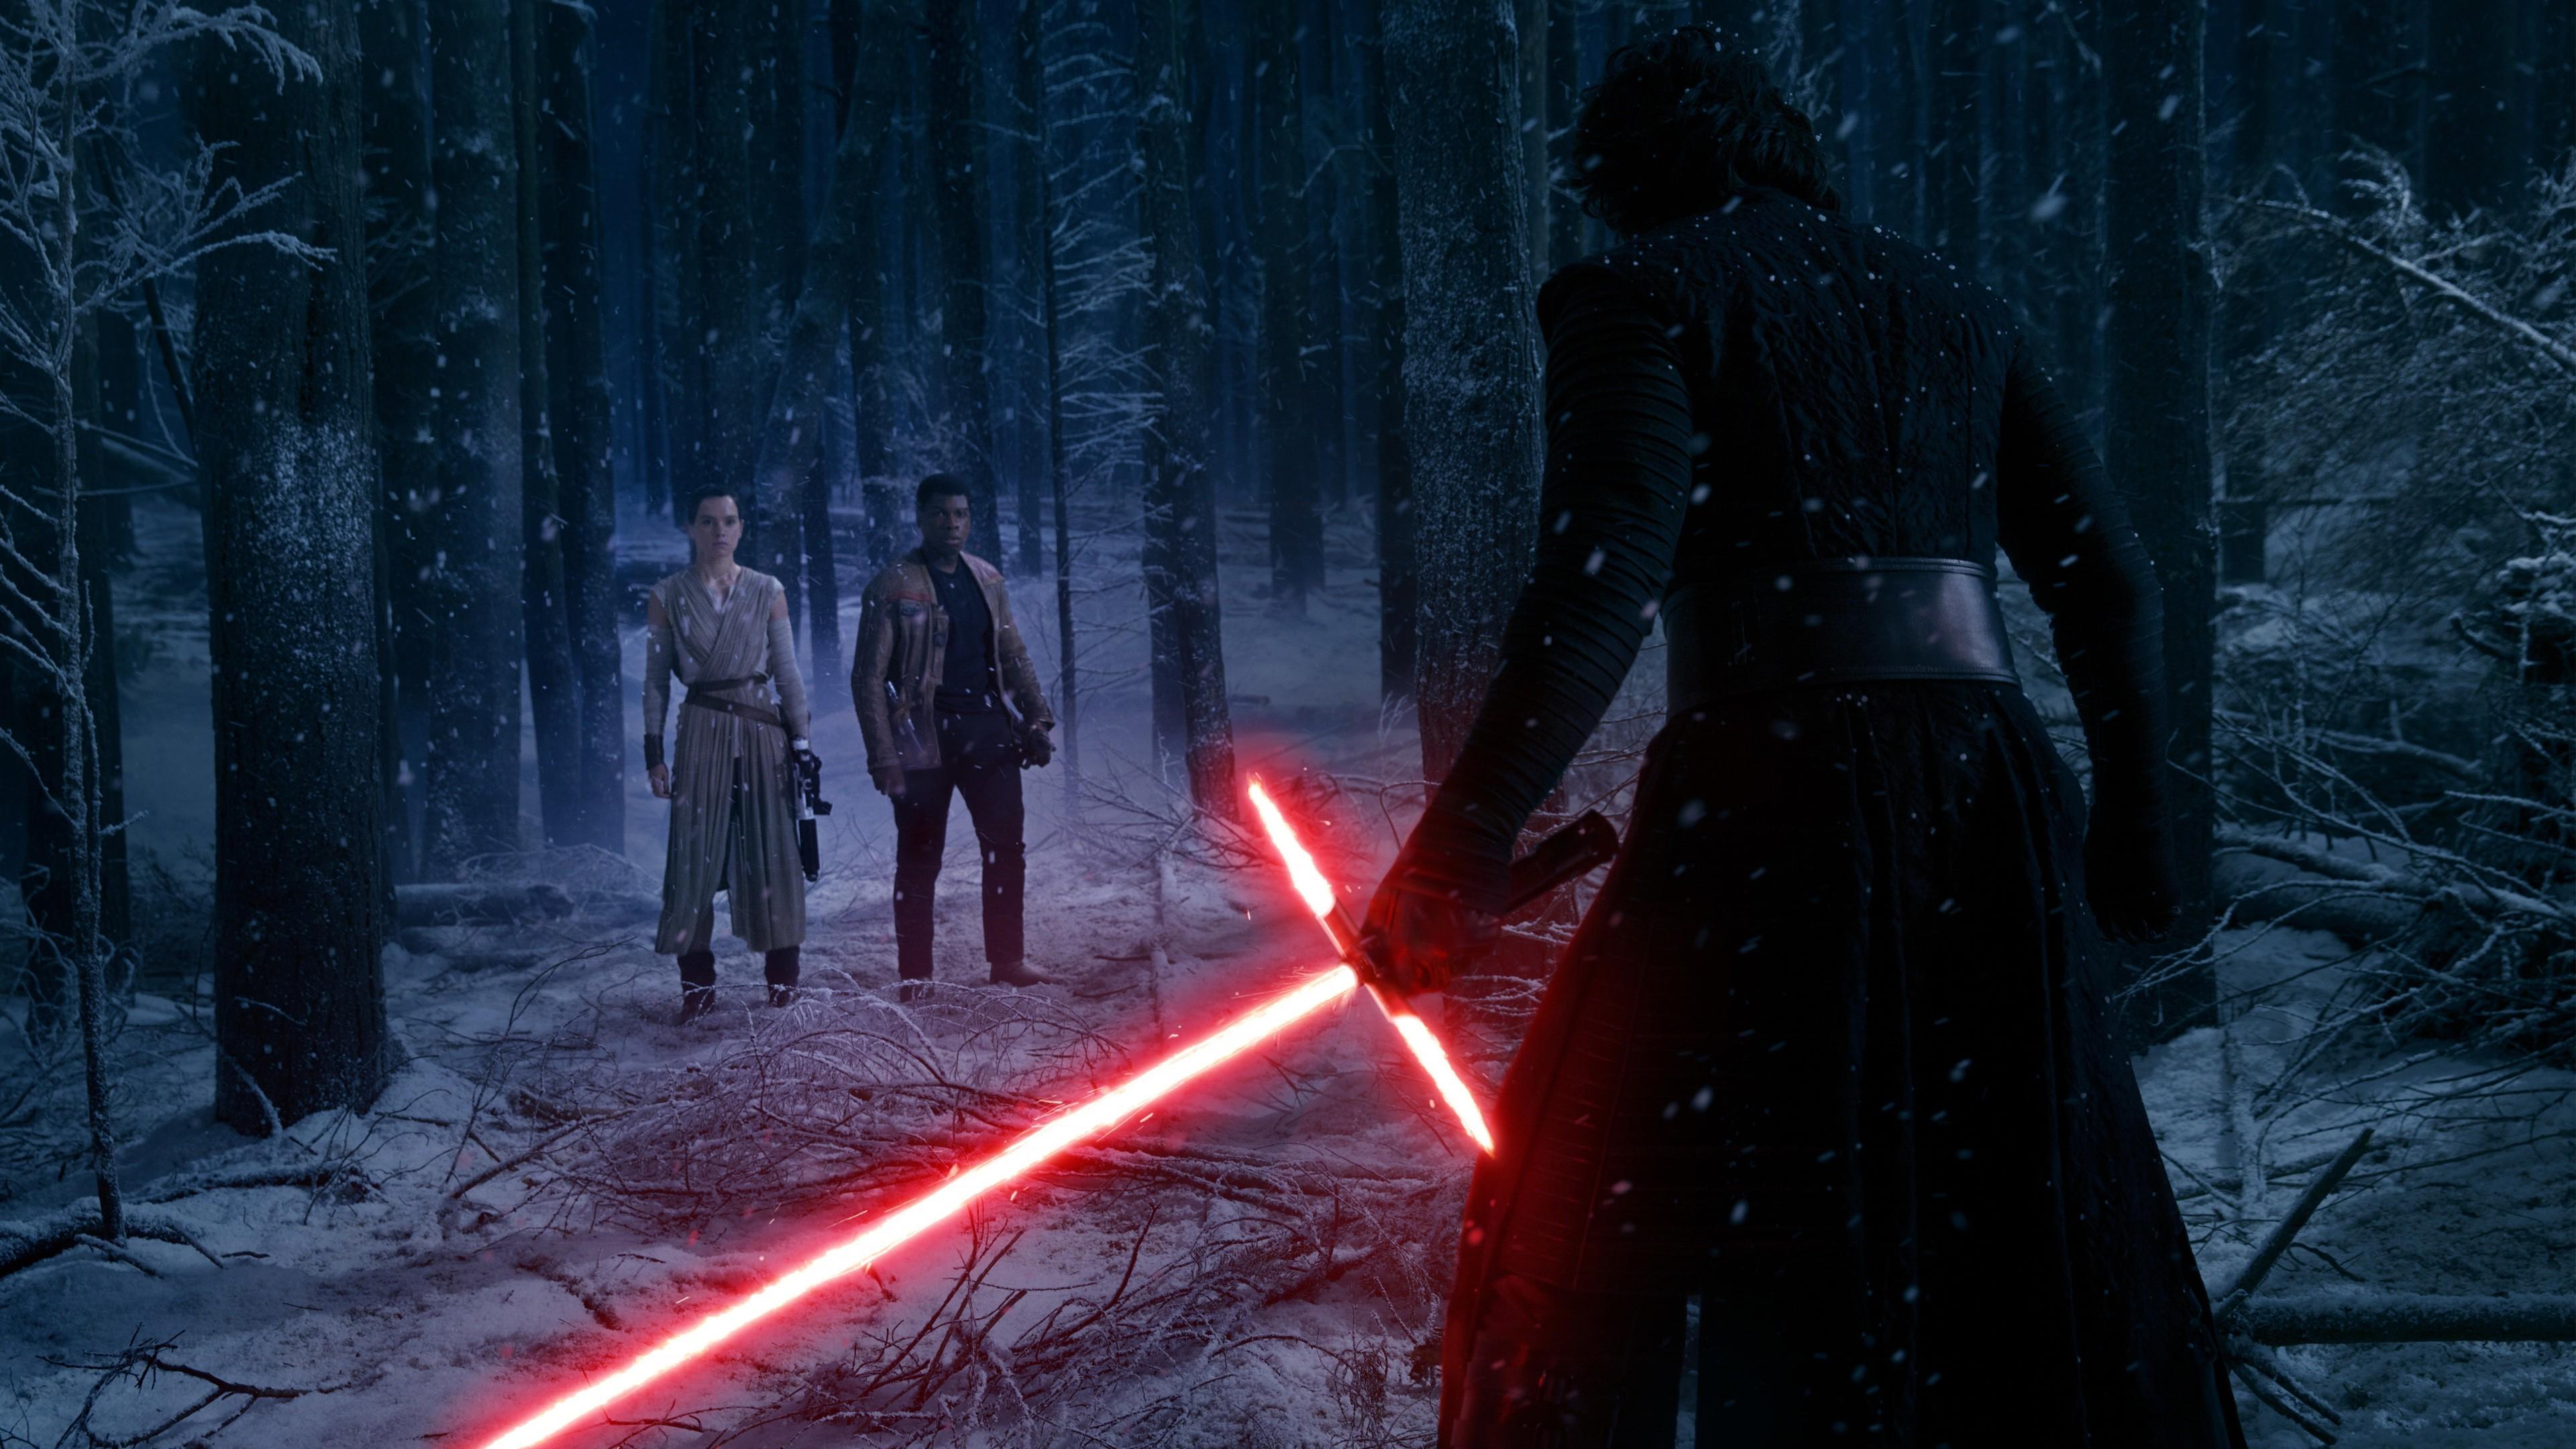 Wallpaper 3840x2160 Px Kylo Ren Star Wars The Force Awakens